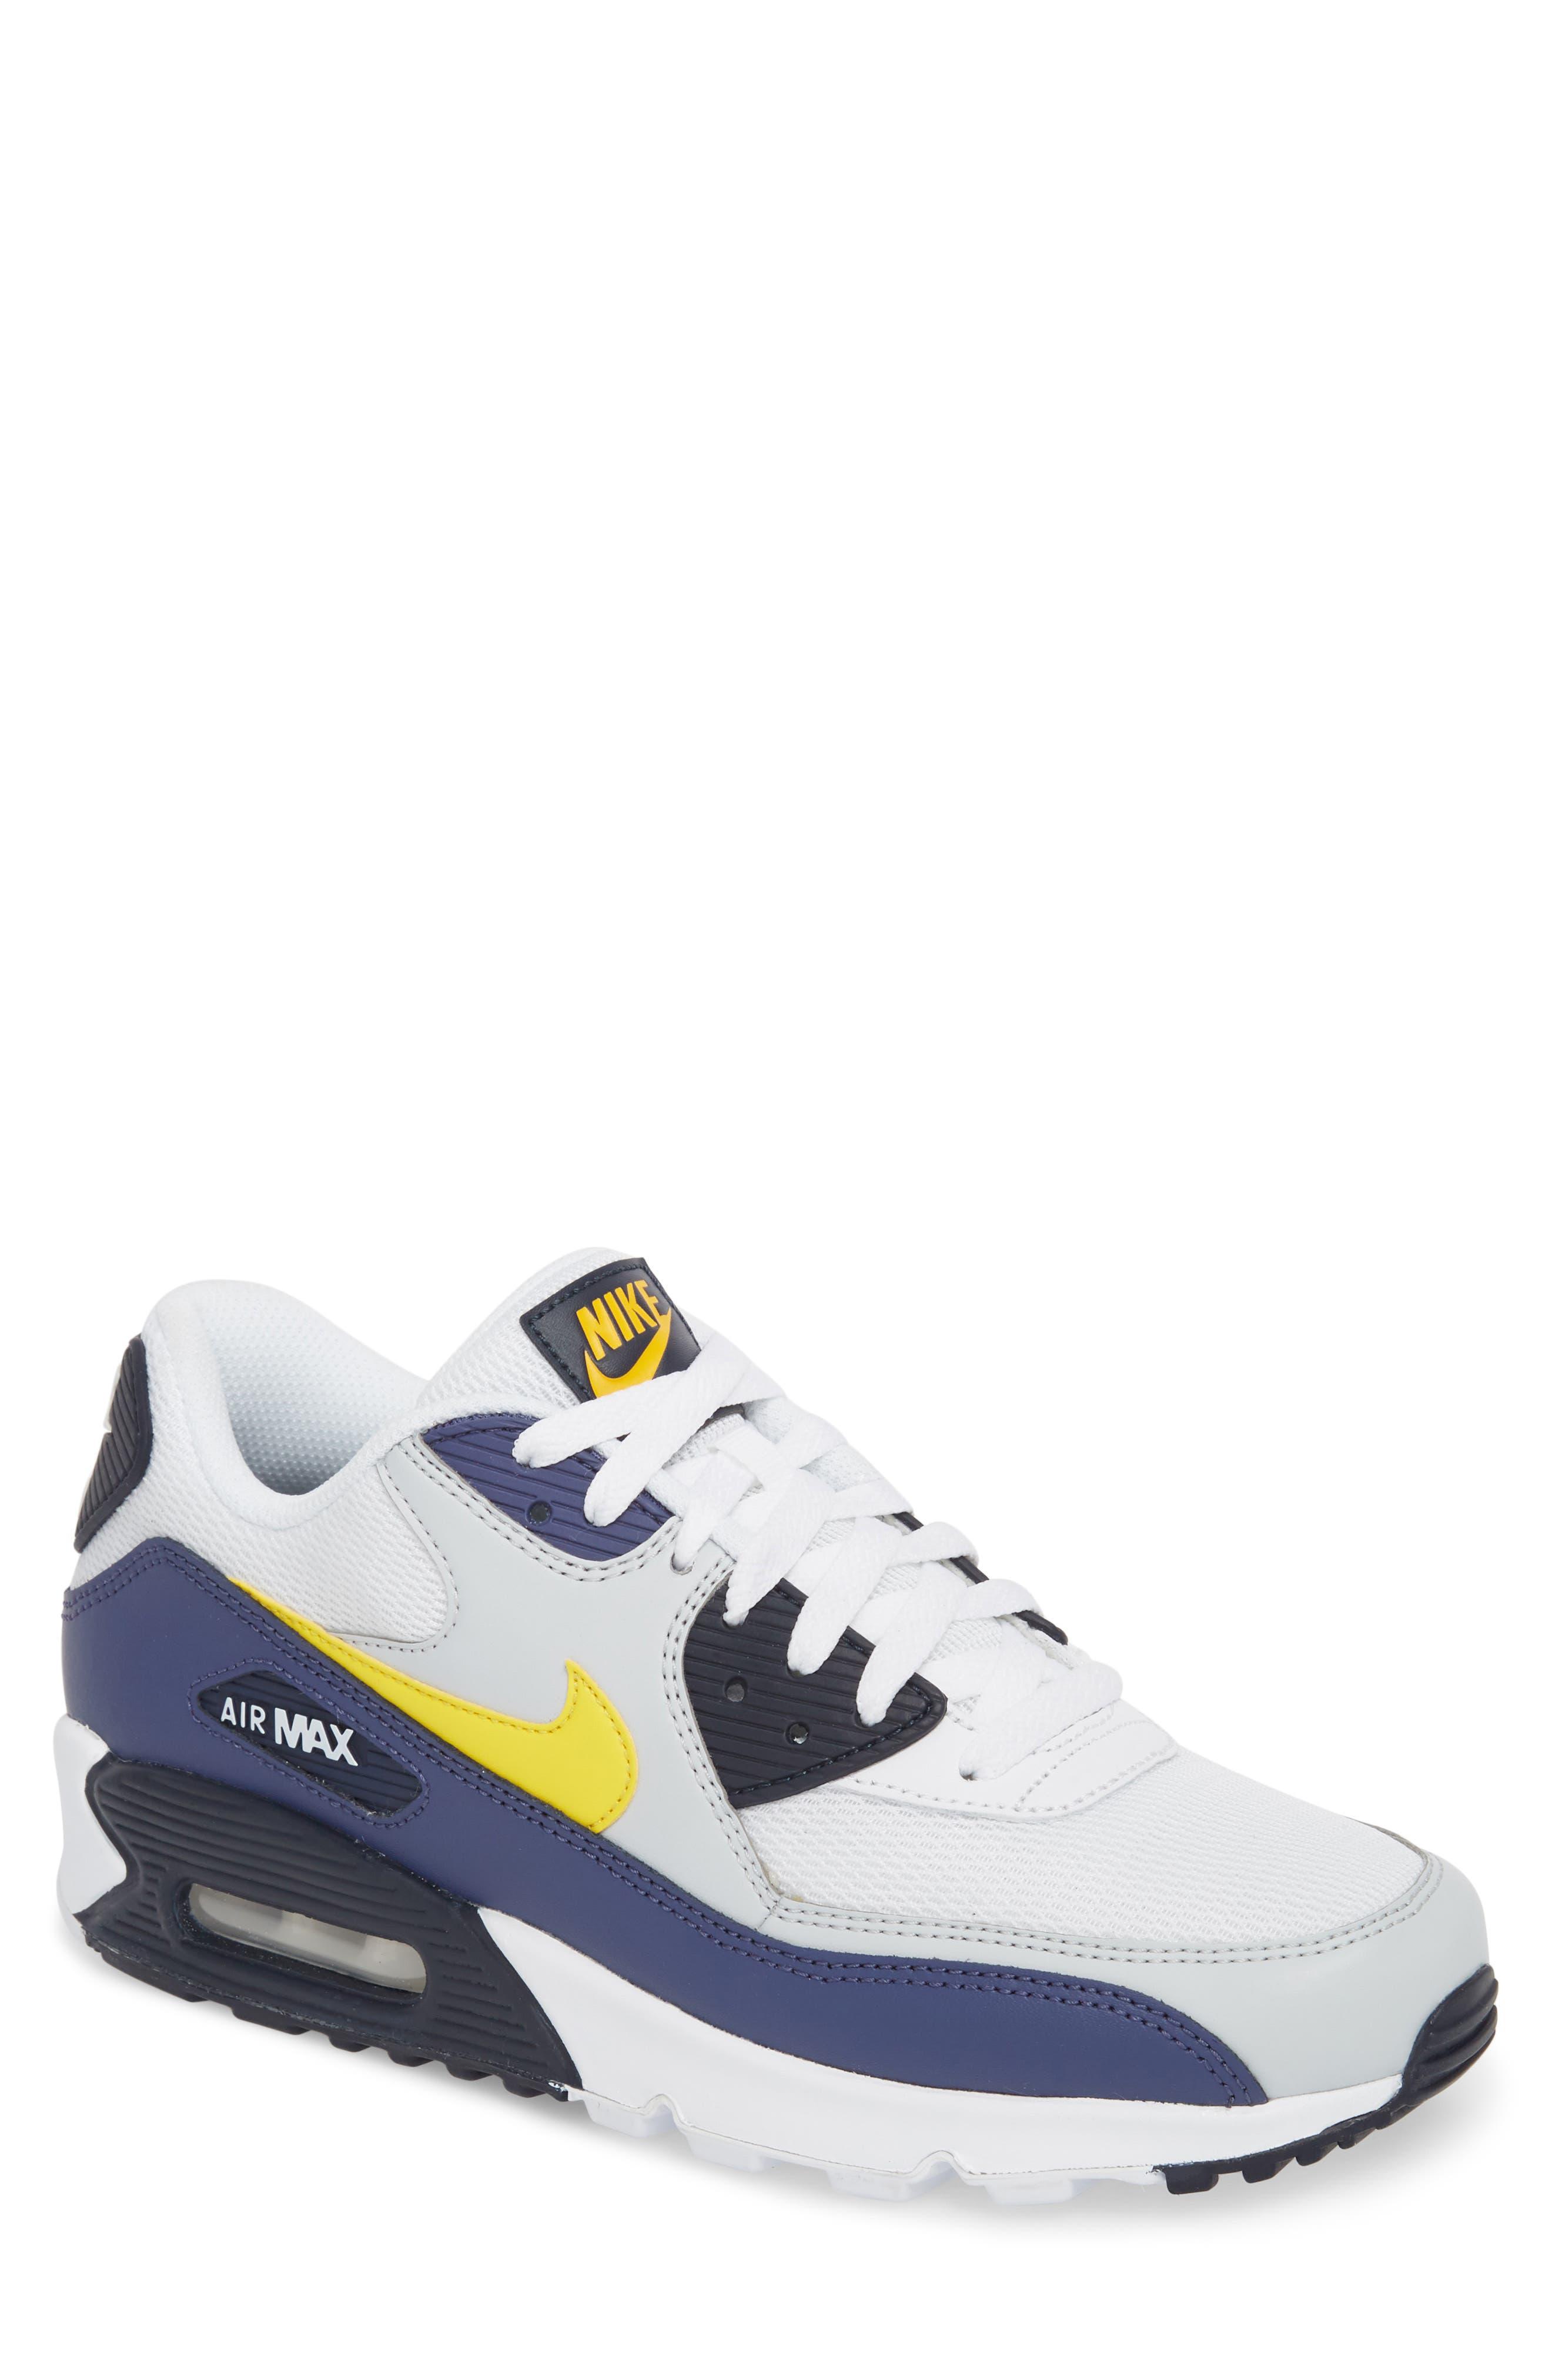 Air Max 90 Essential Sneaker,                         Main,                         color, White/ Tour Yellow/ Blue